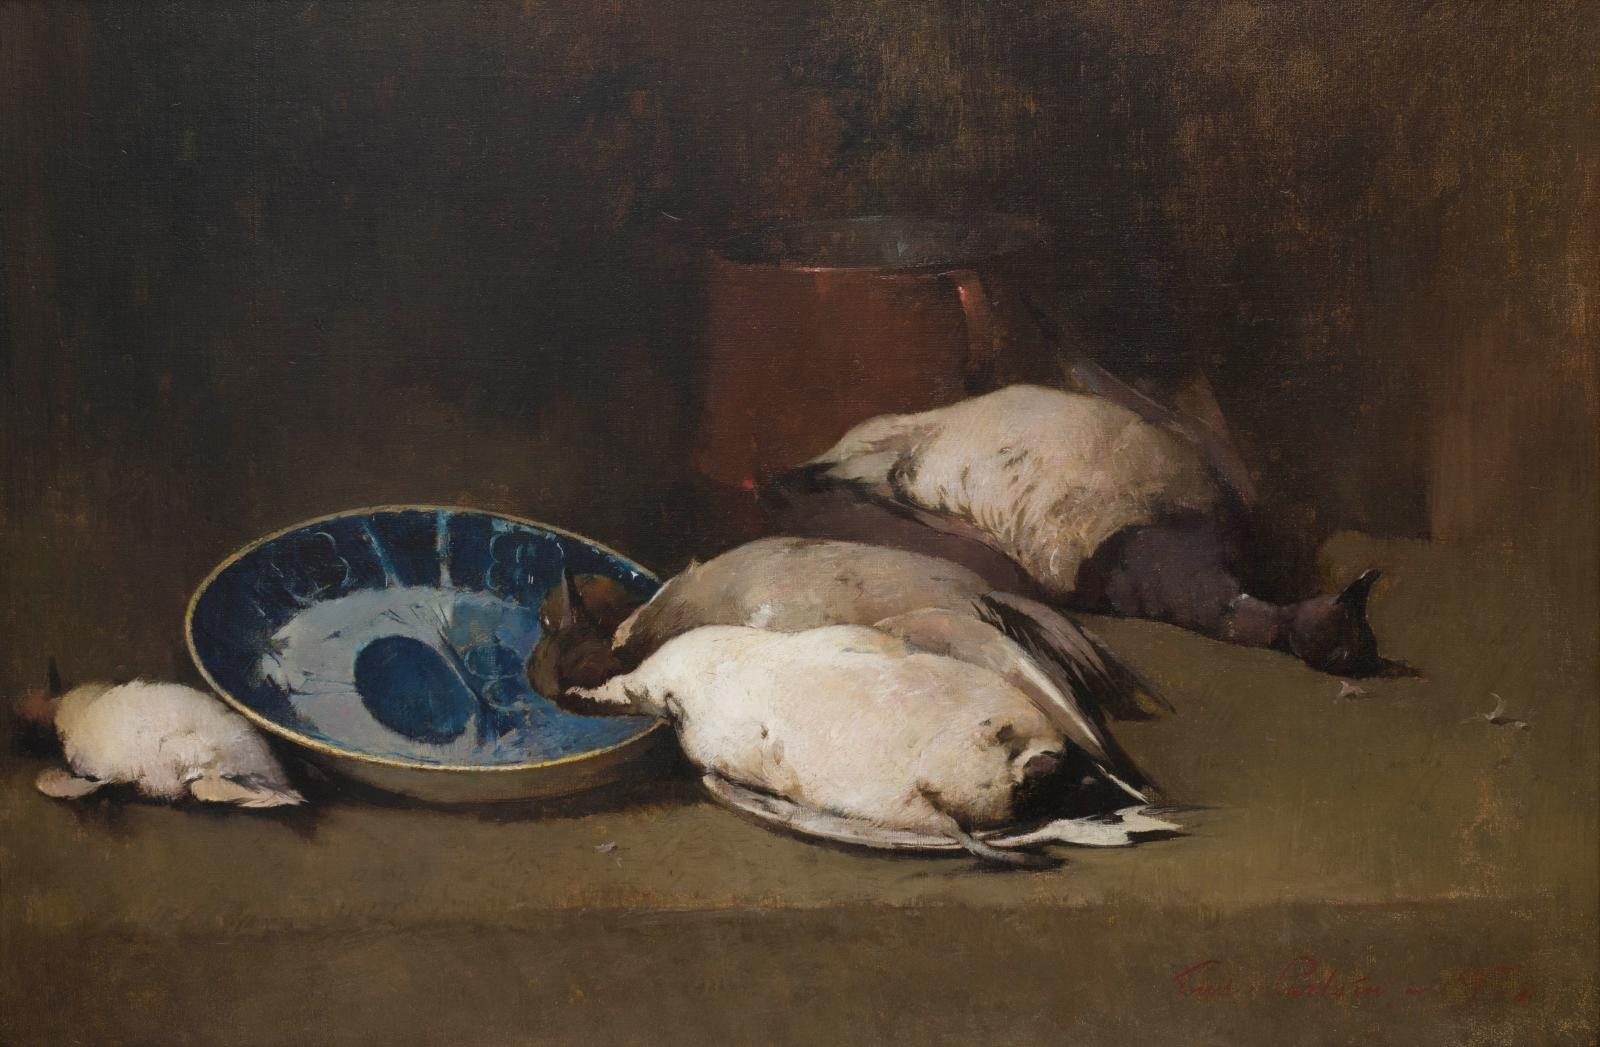 A still life with dead ducks on a table top